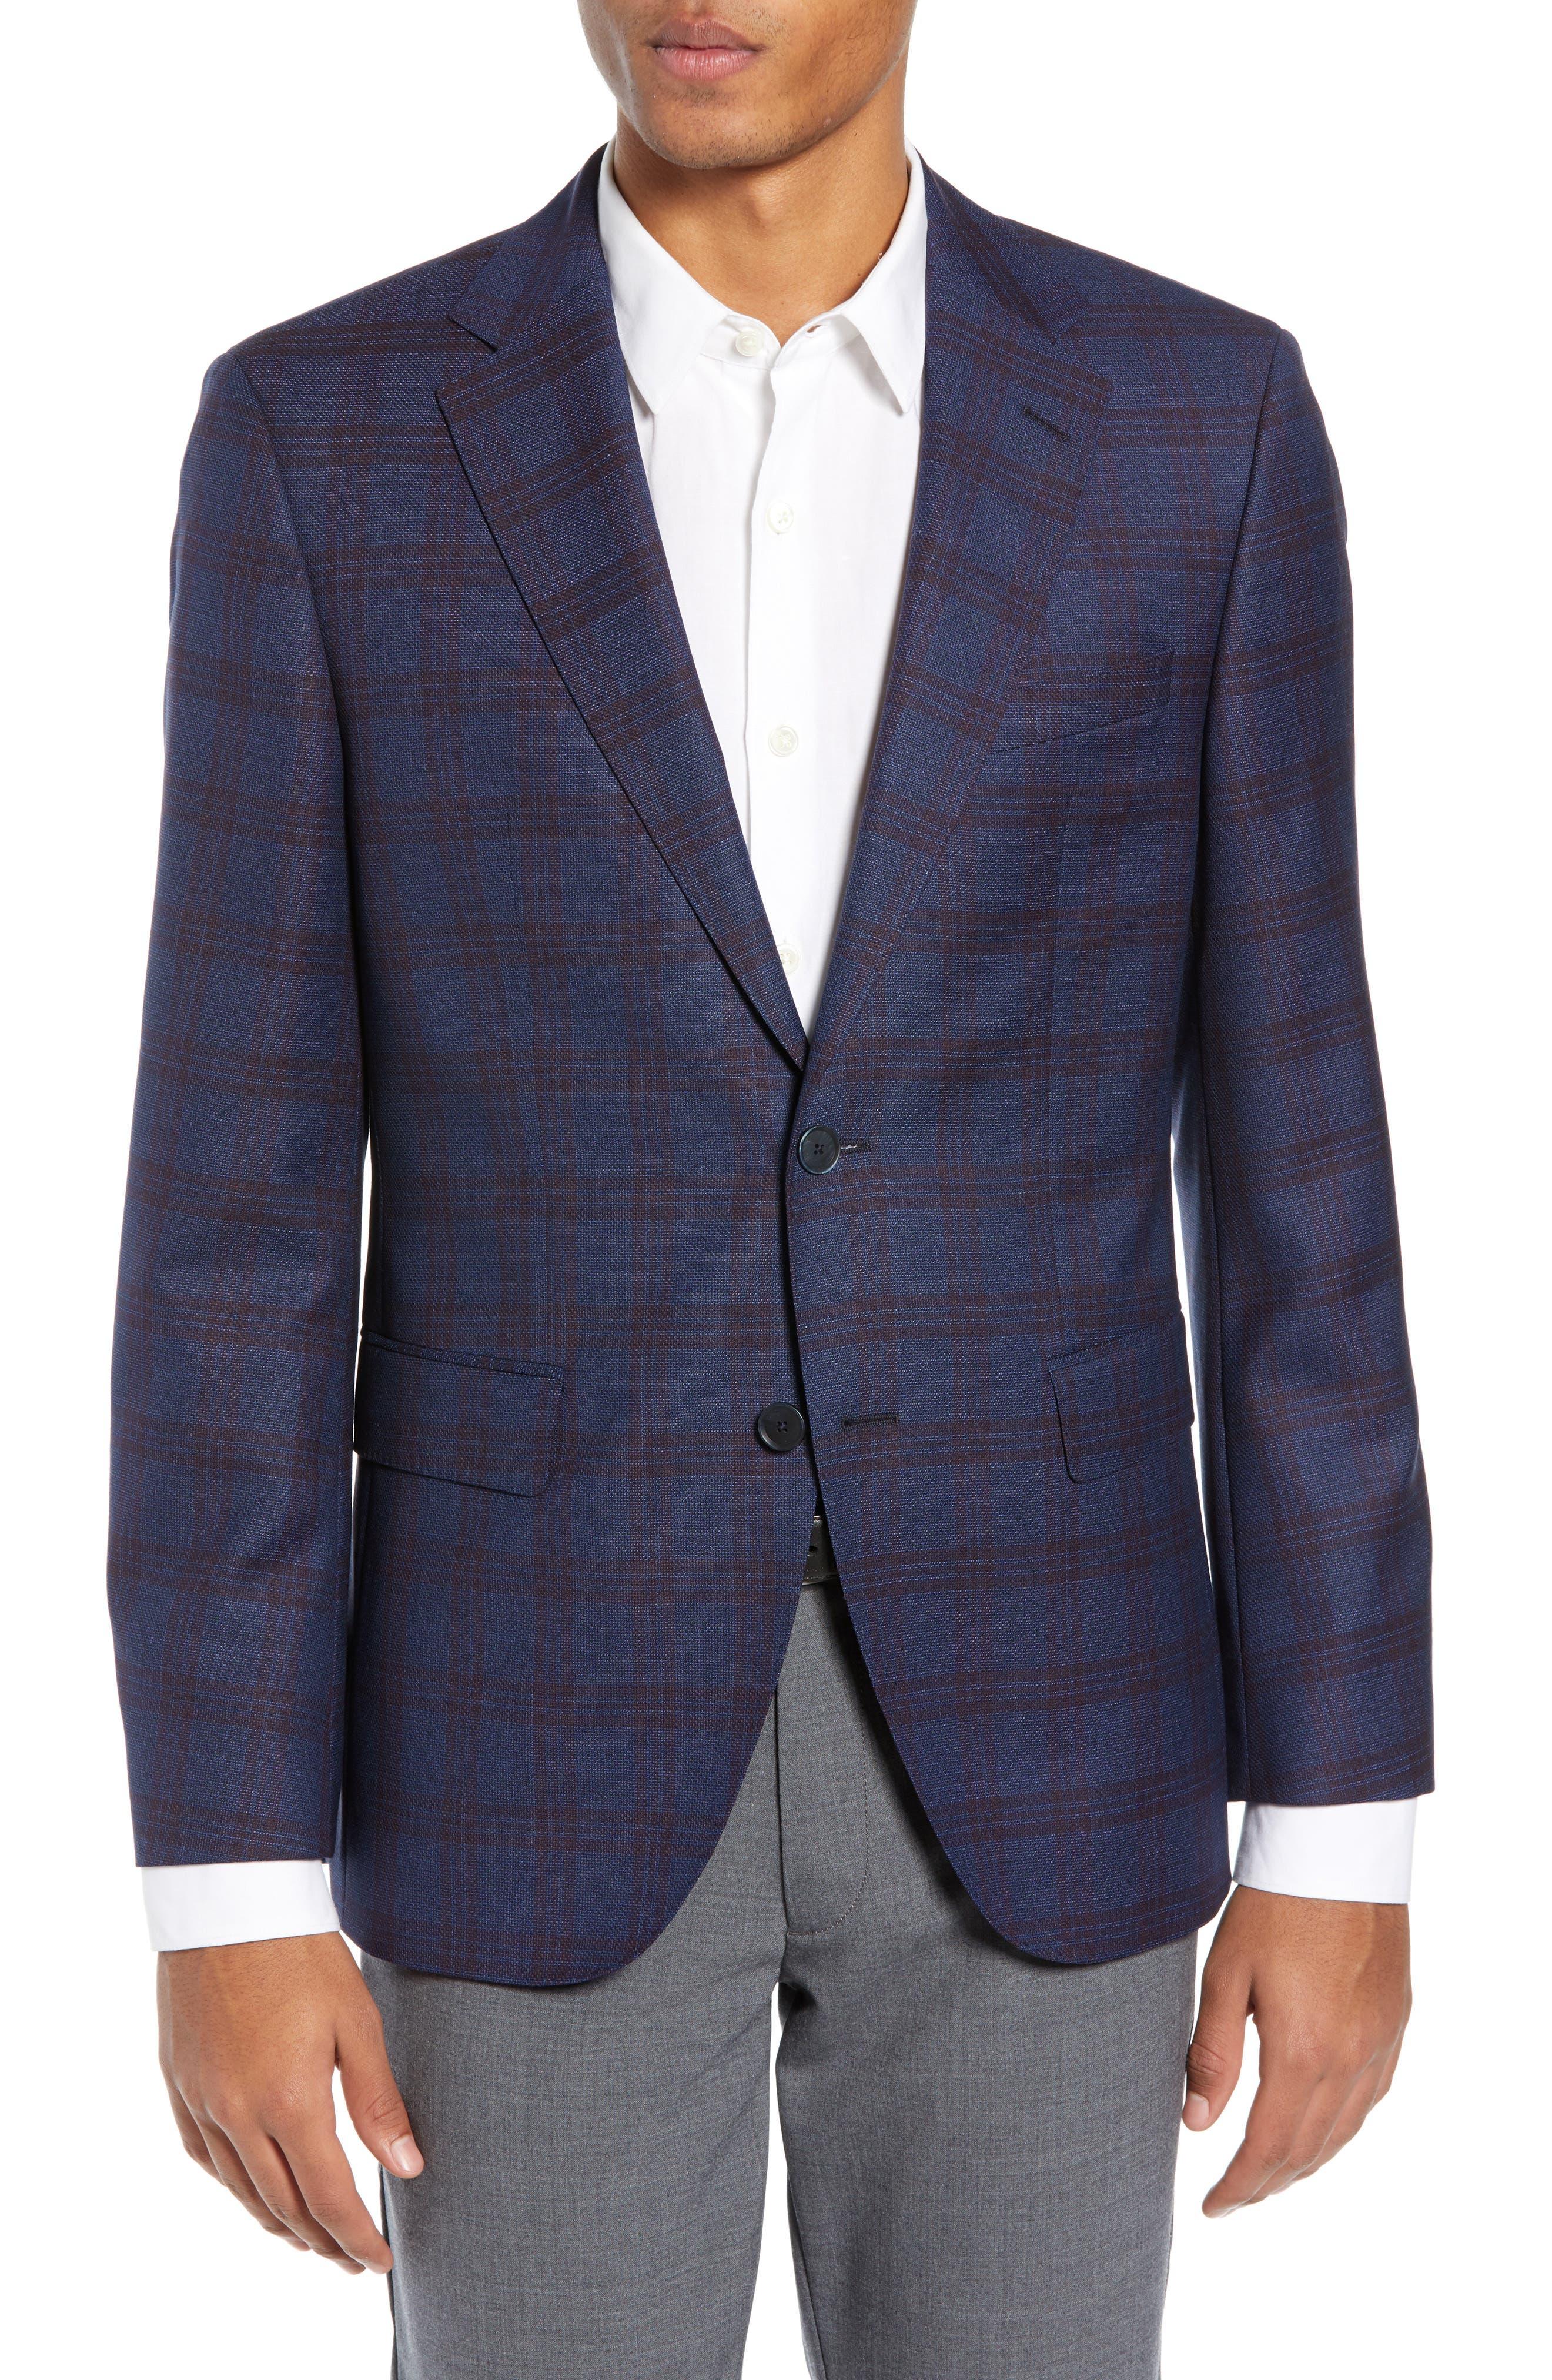 Jewels Classic Fit Plaid Wool Sport Coat,                             Main thumbnail 1, color,                             OPEN BLUE